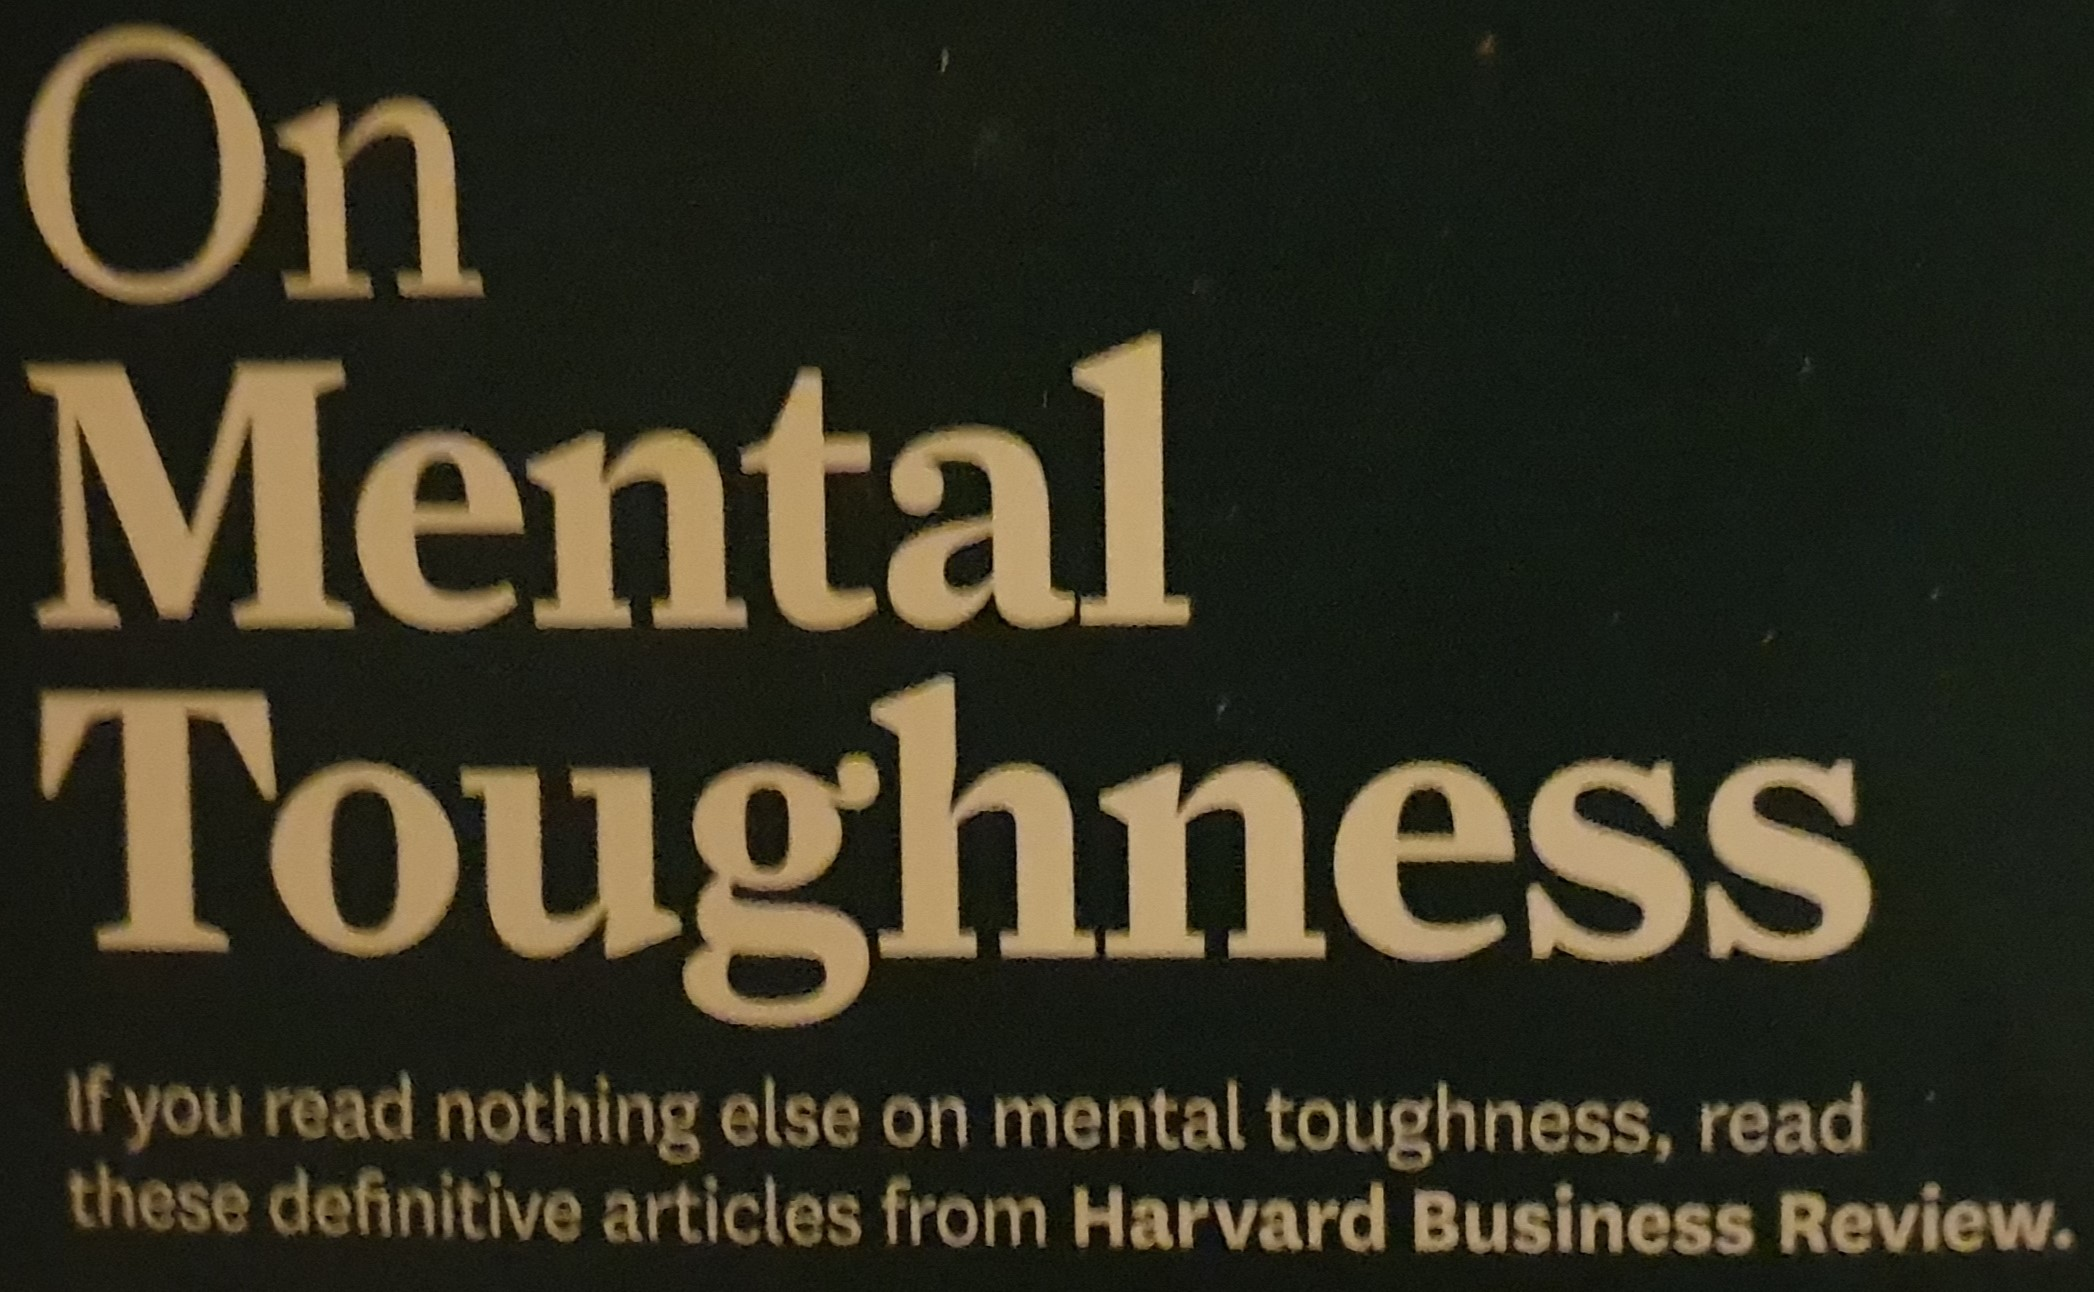 On Mental Toughness